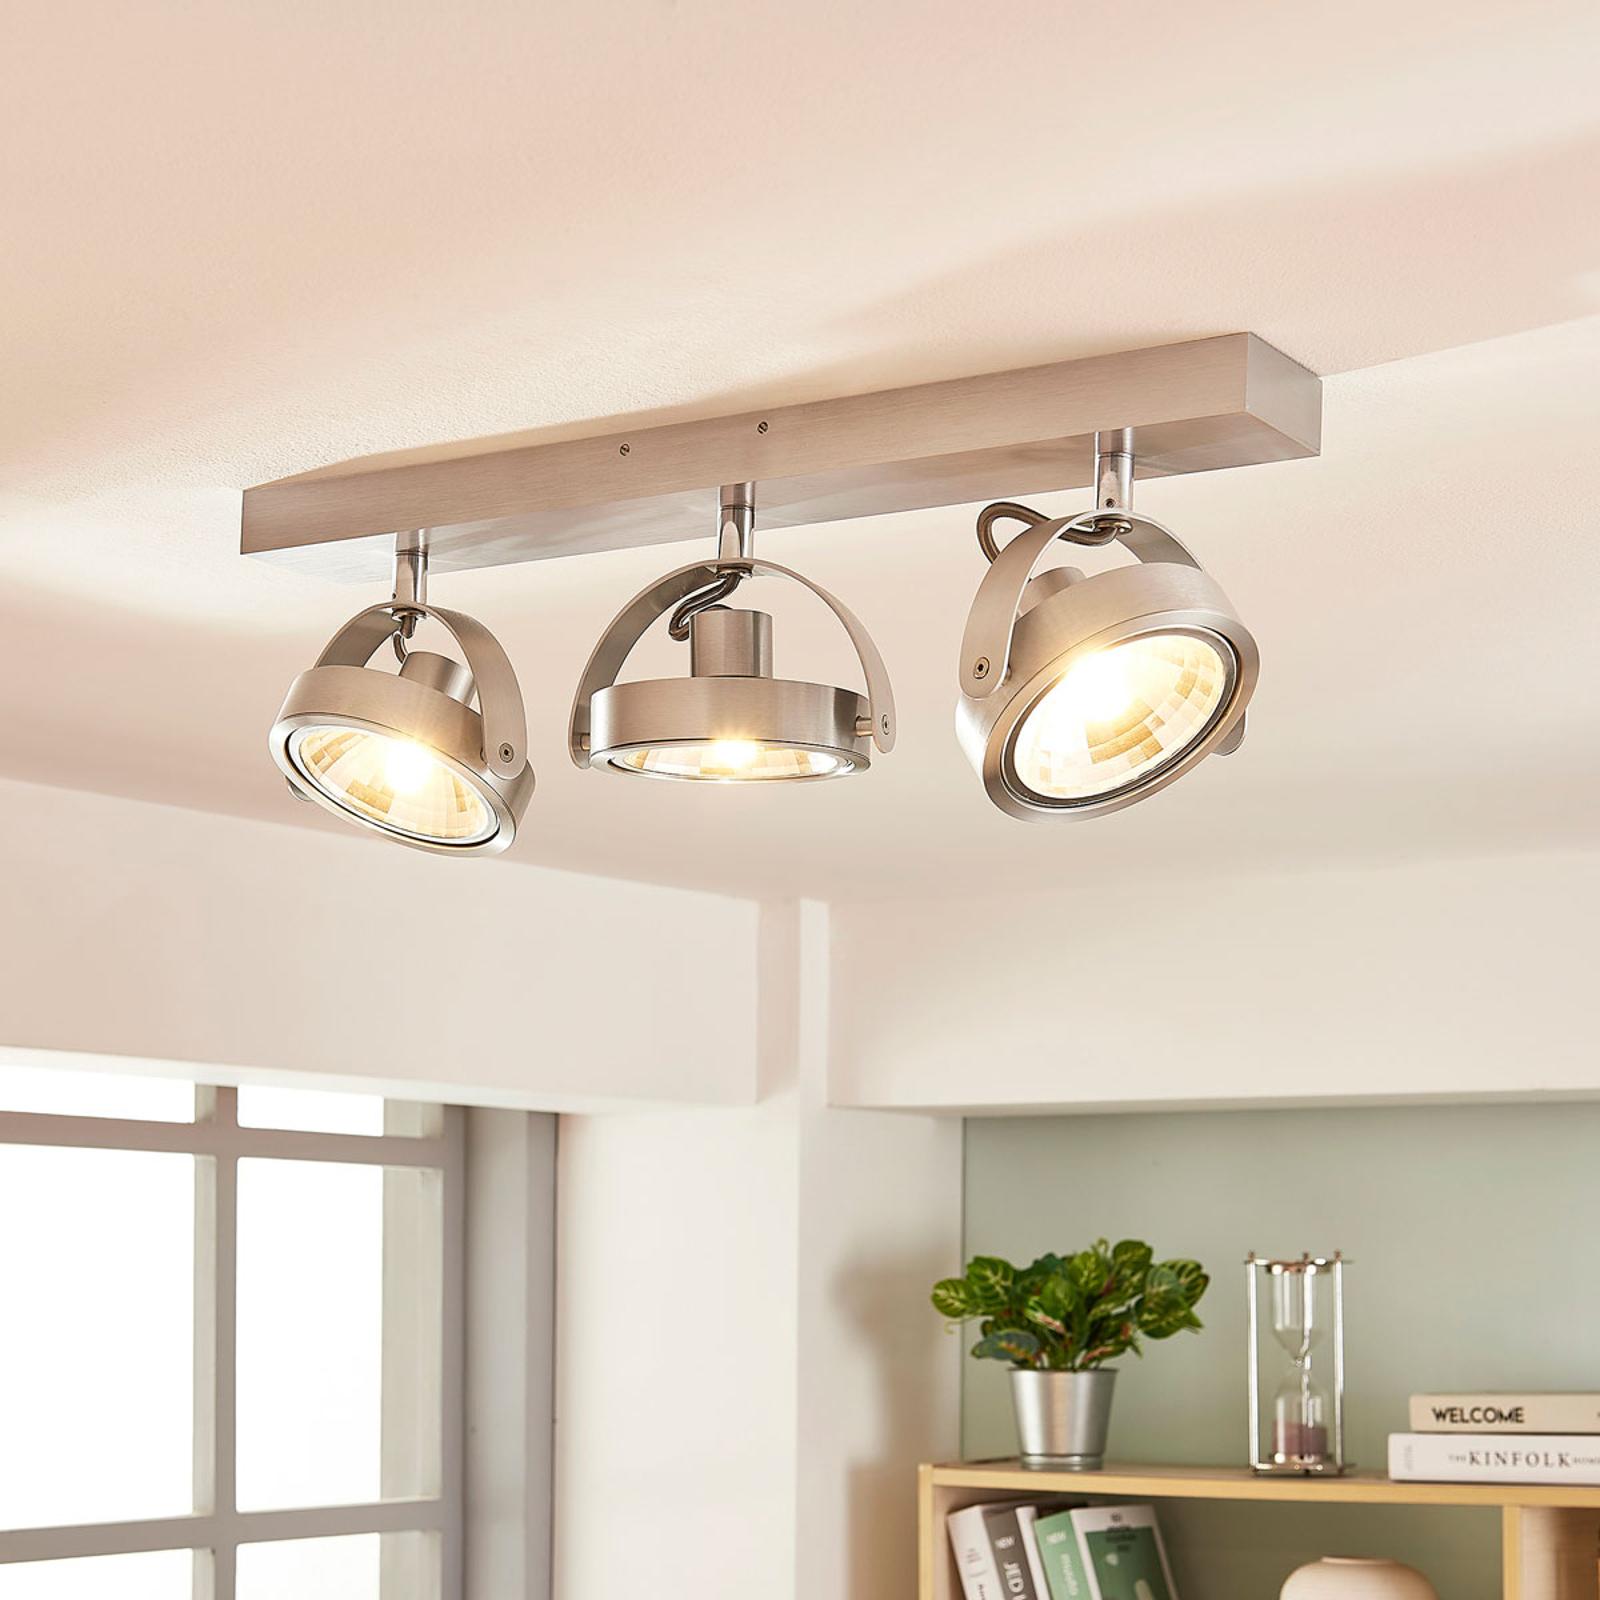 LED-takspot Lieven i aluminium, 3 lys